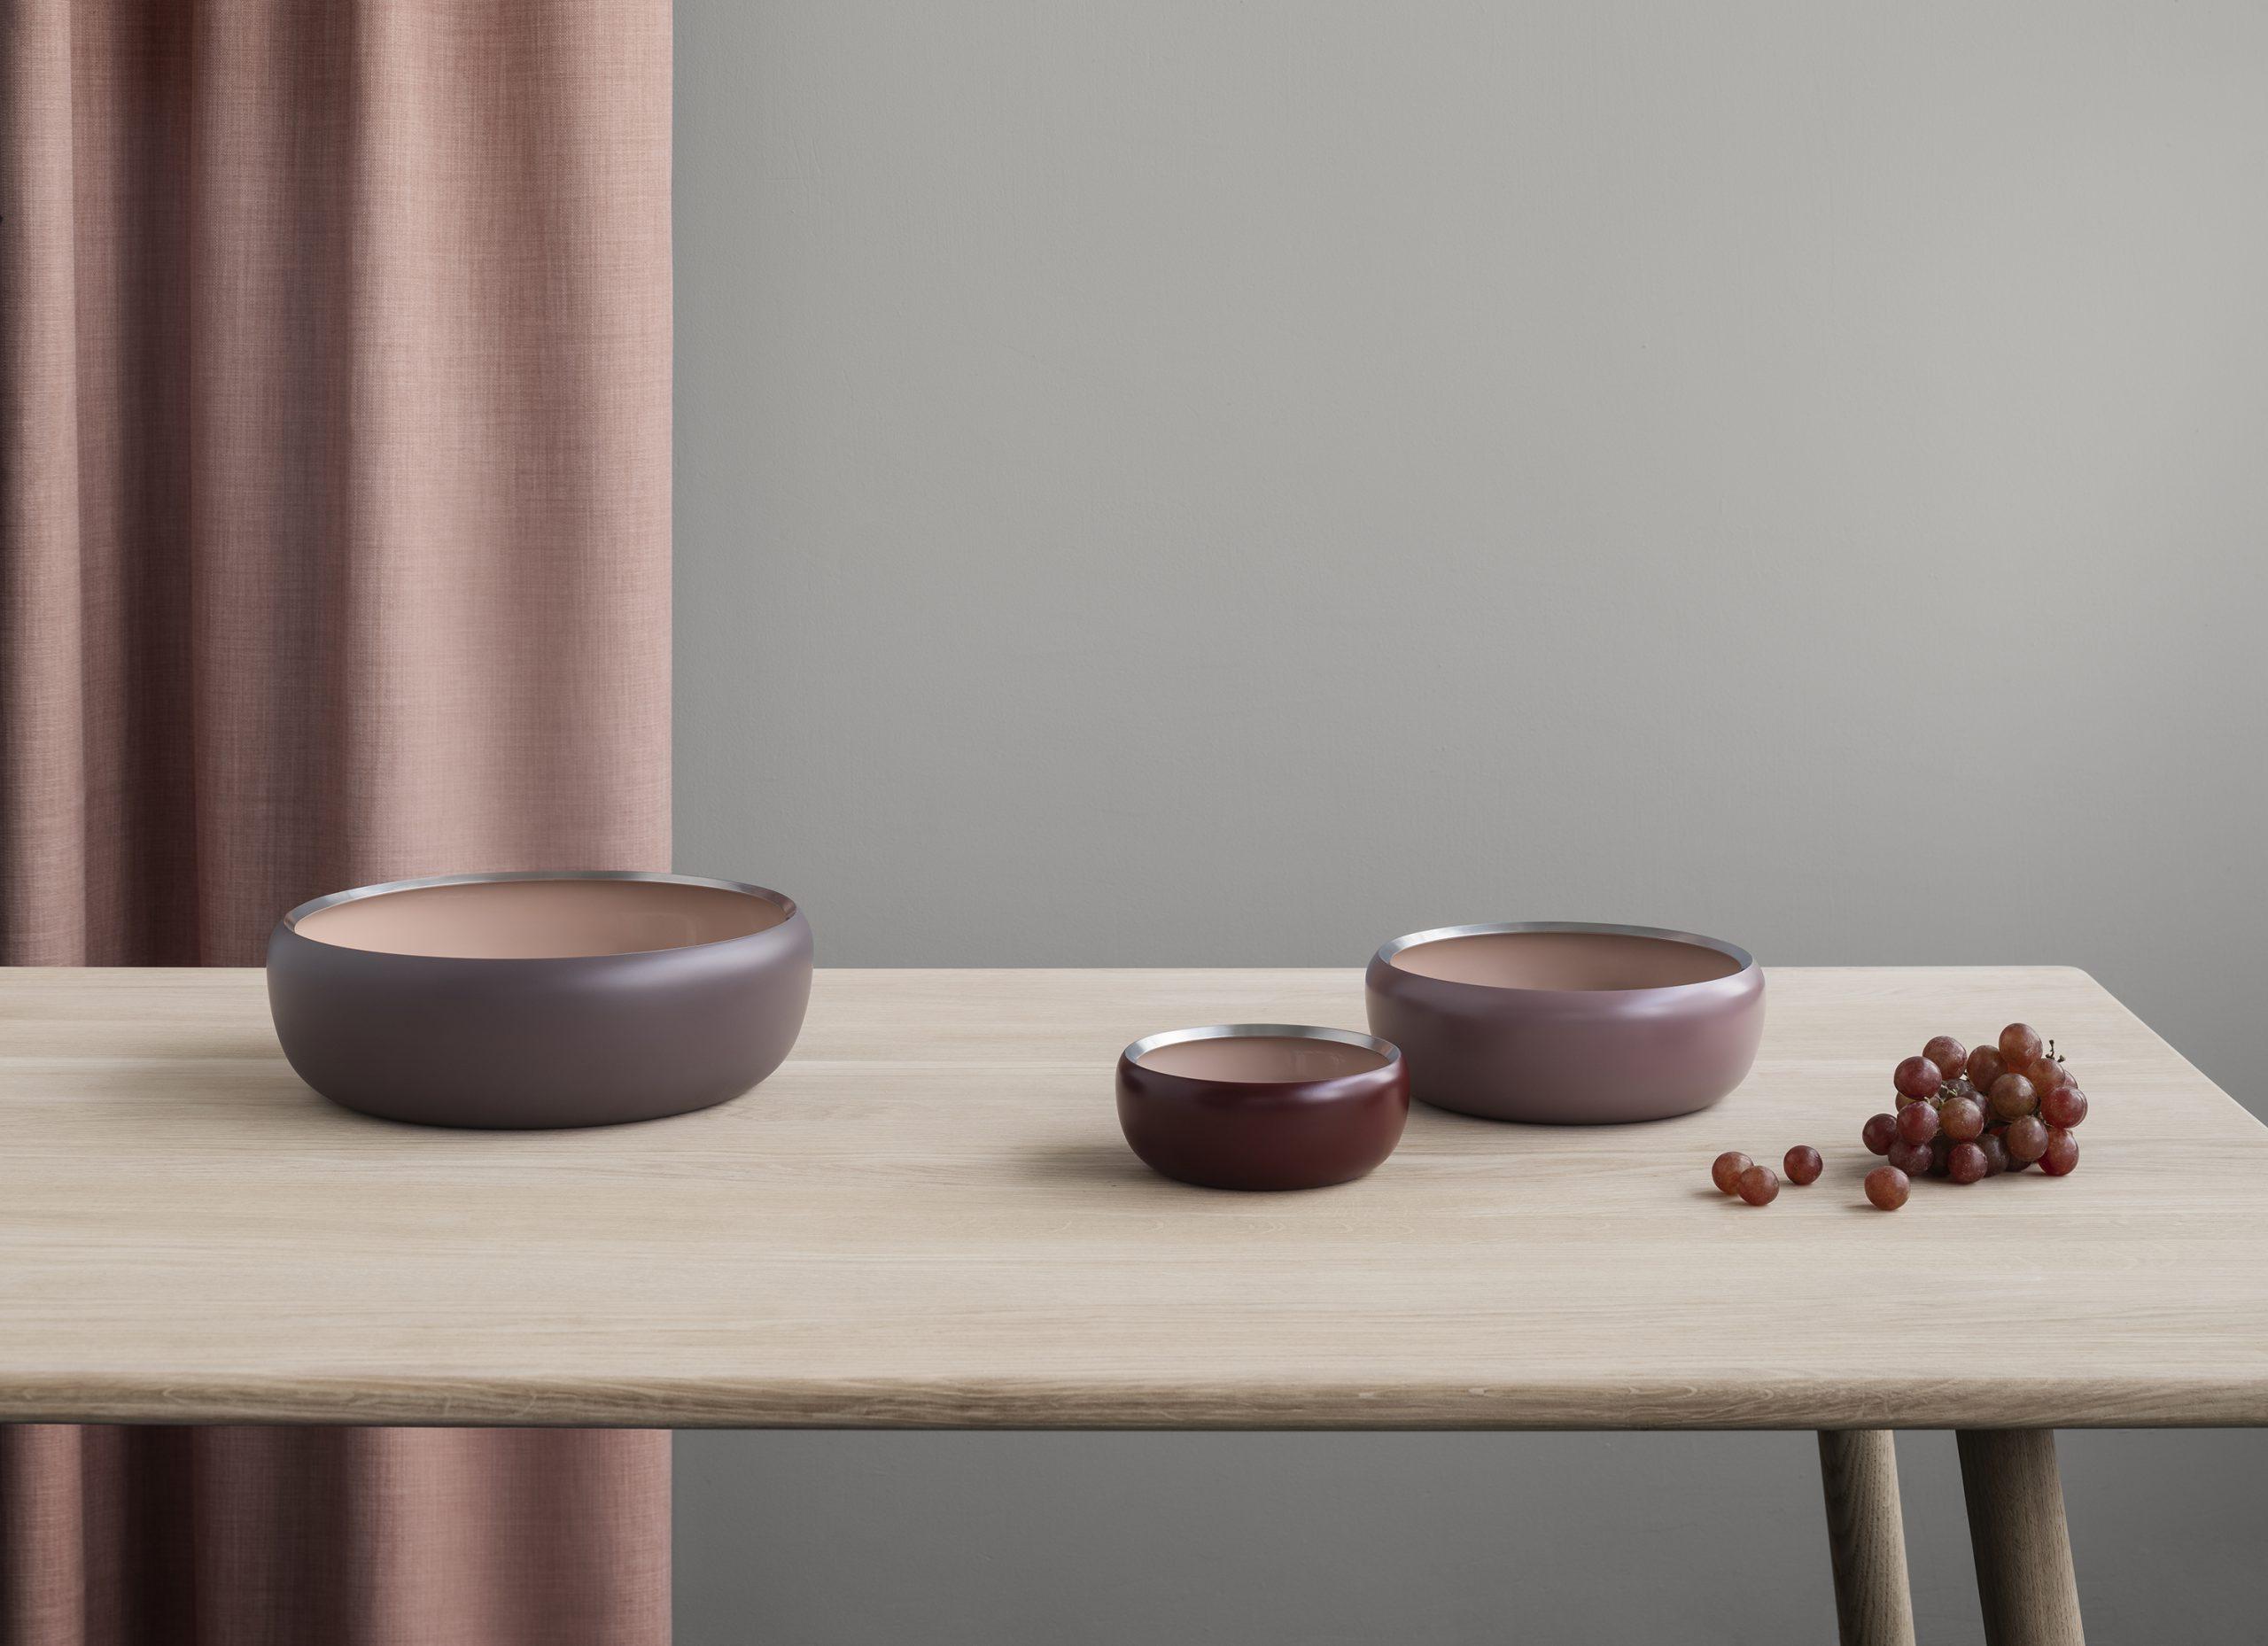 Ora bowls in Blush by Debiasi Sandri for Stelton